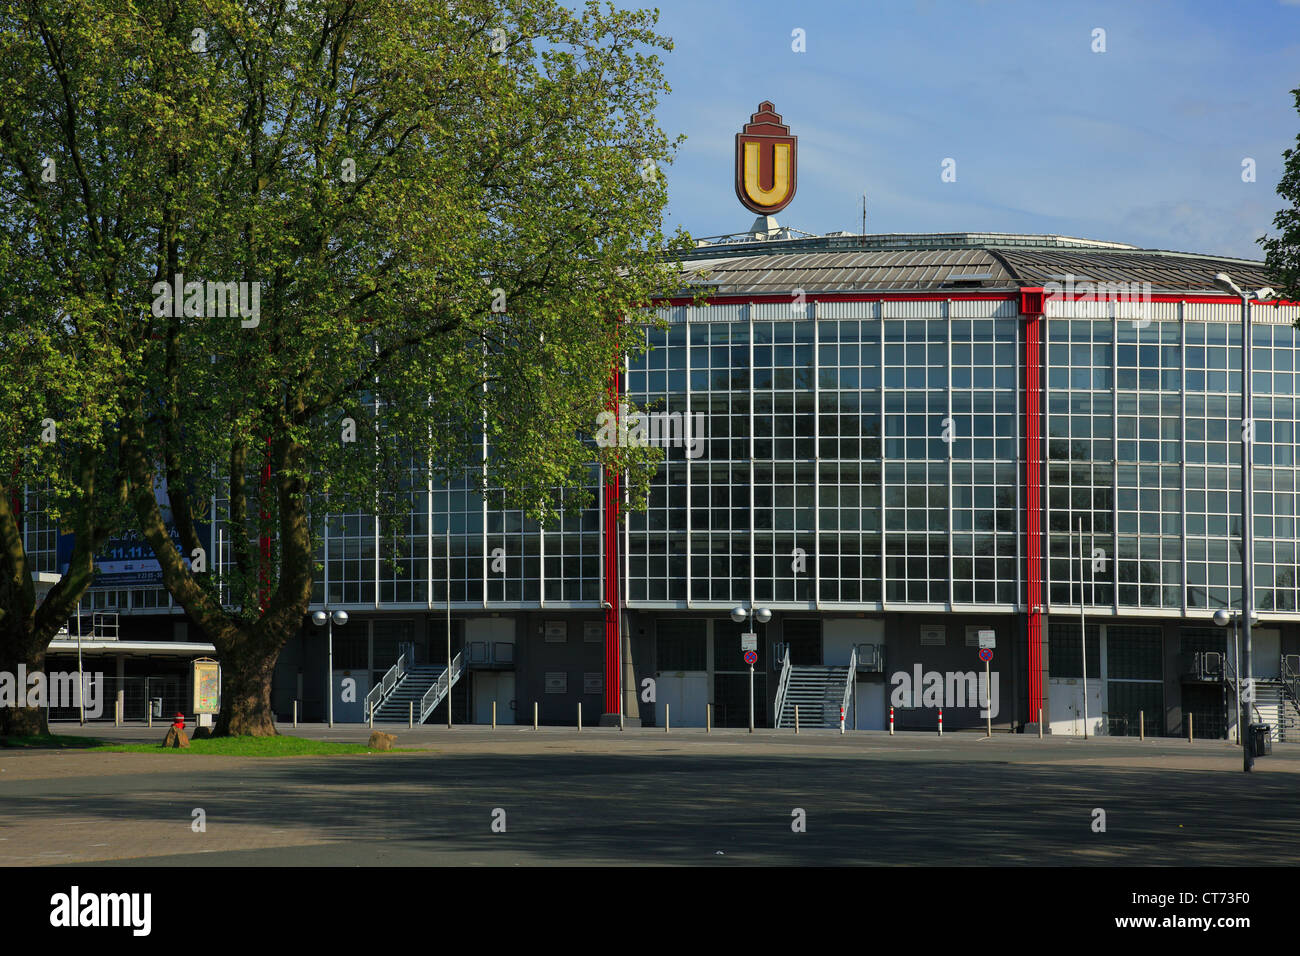 D-Dortmund, Ruhr area, Westphalia, North Rhine-Westphalia, NRW, Westfalenhallen Dortmund, Halls of Westphalia, exhibition - Stock Image